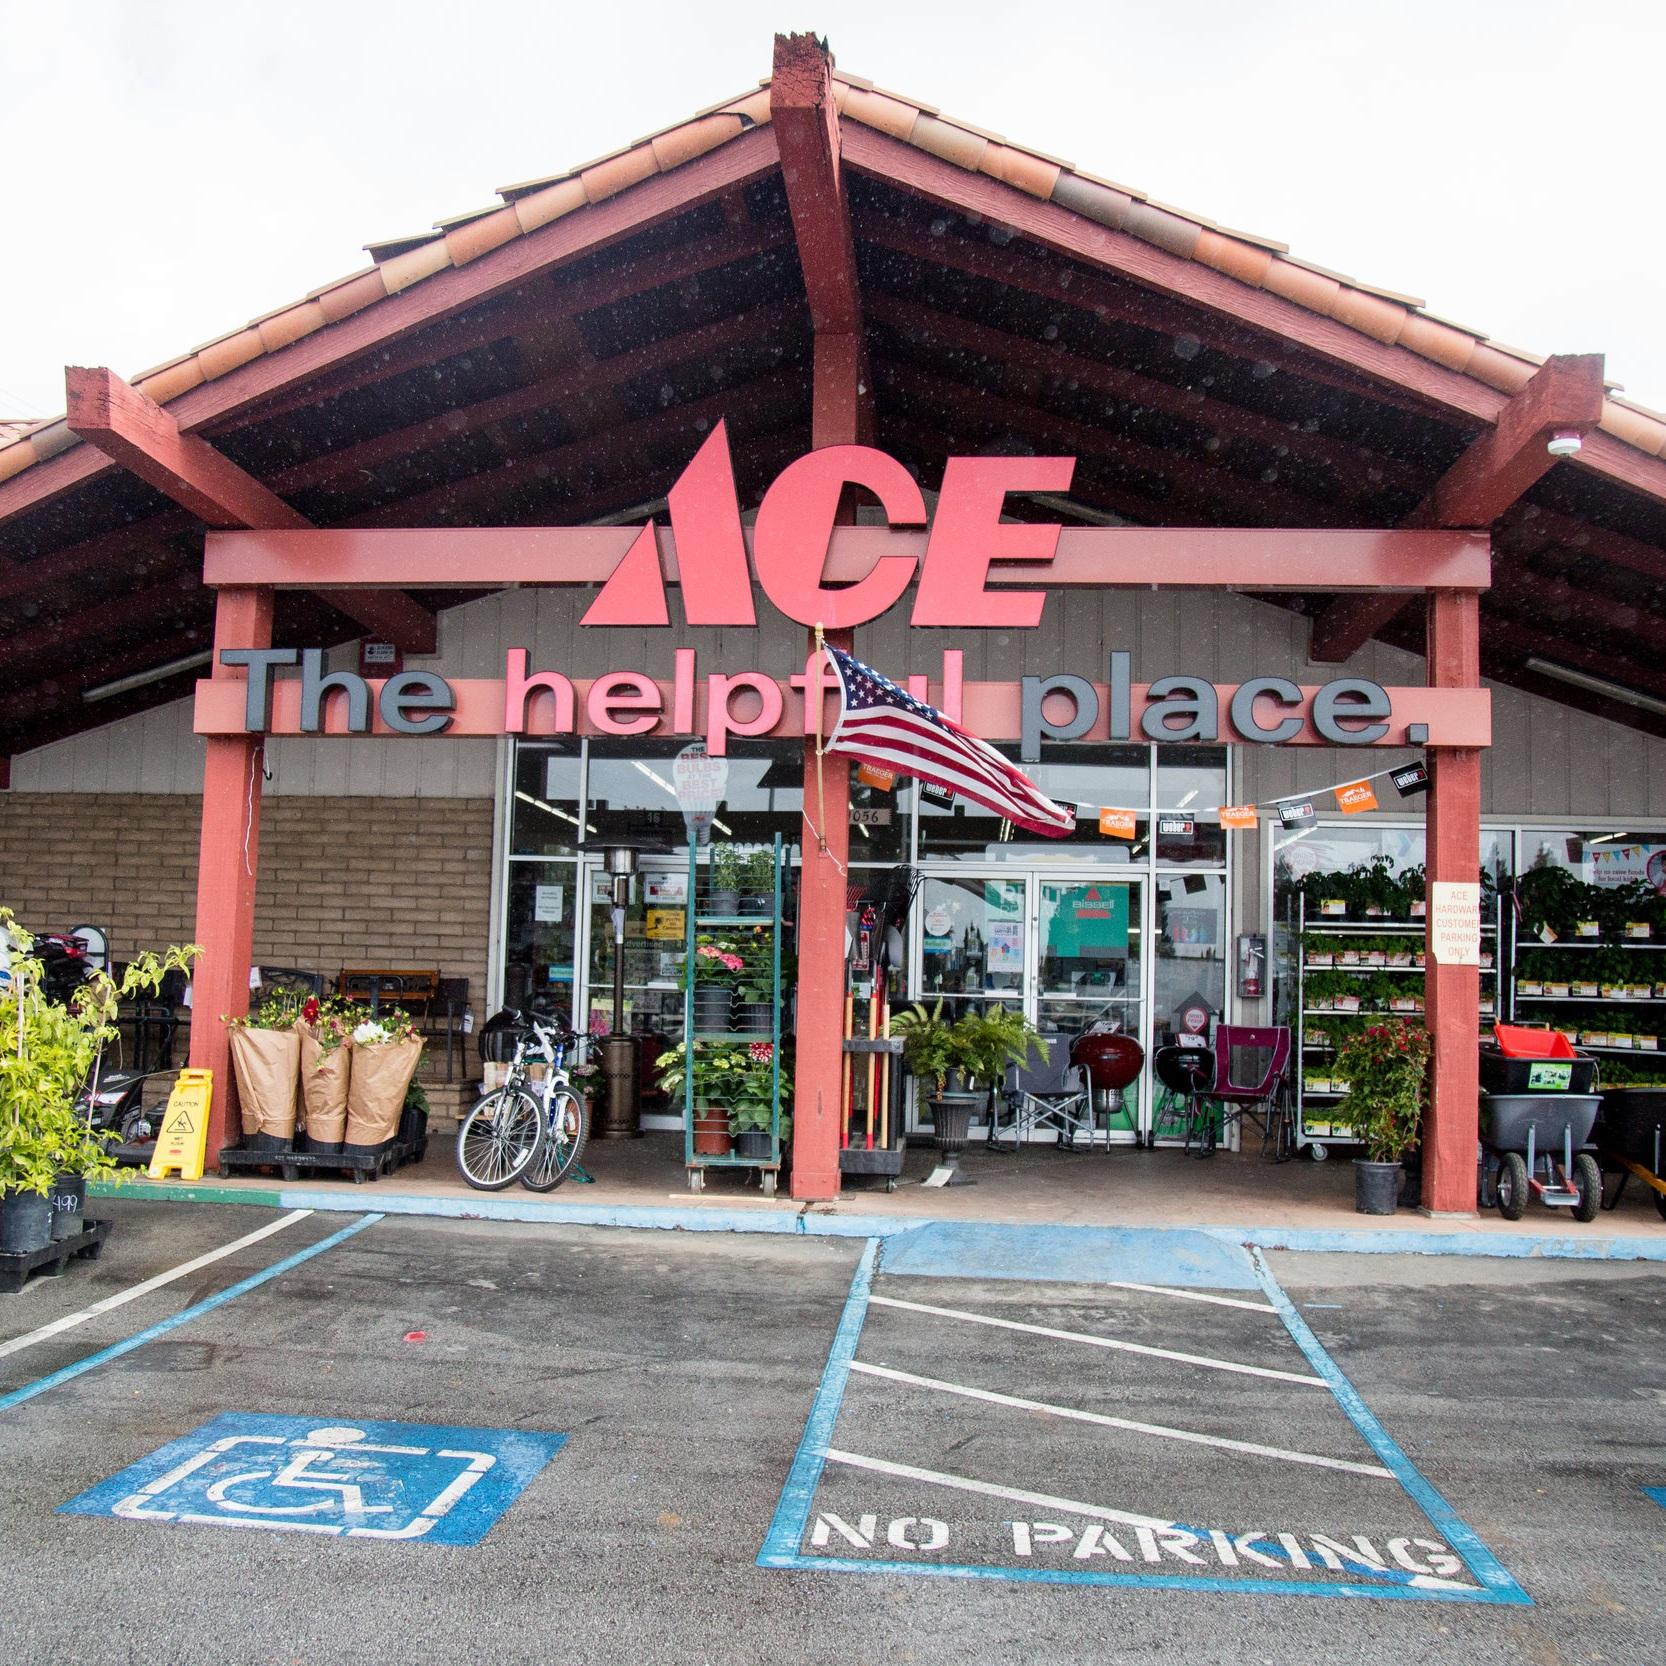 Ace Hardware   1056 East Lake Ave, Watsonville, CA 95076 P.(831) 724-4795